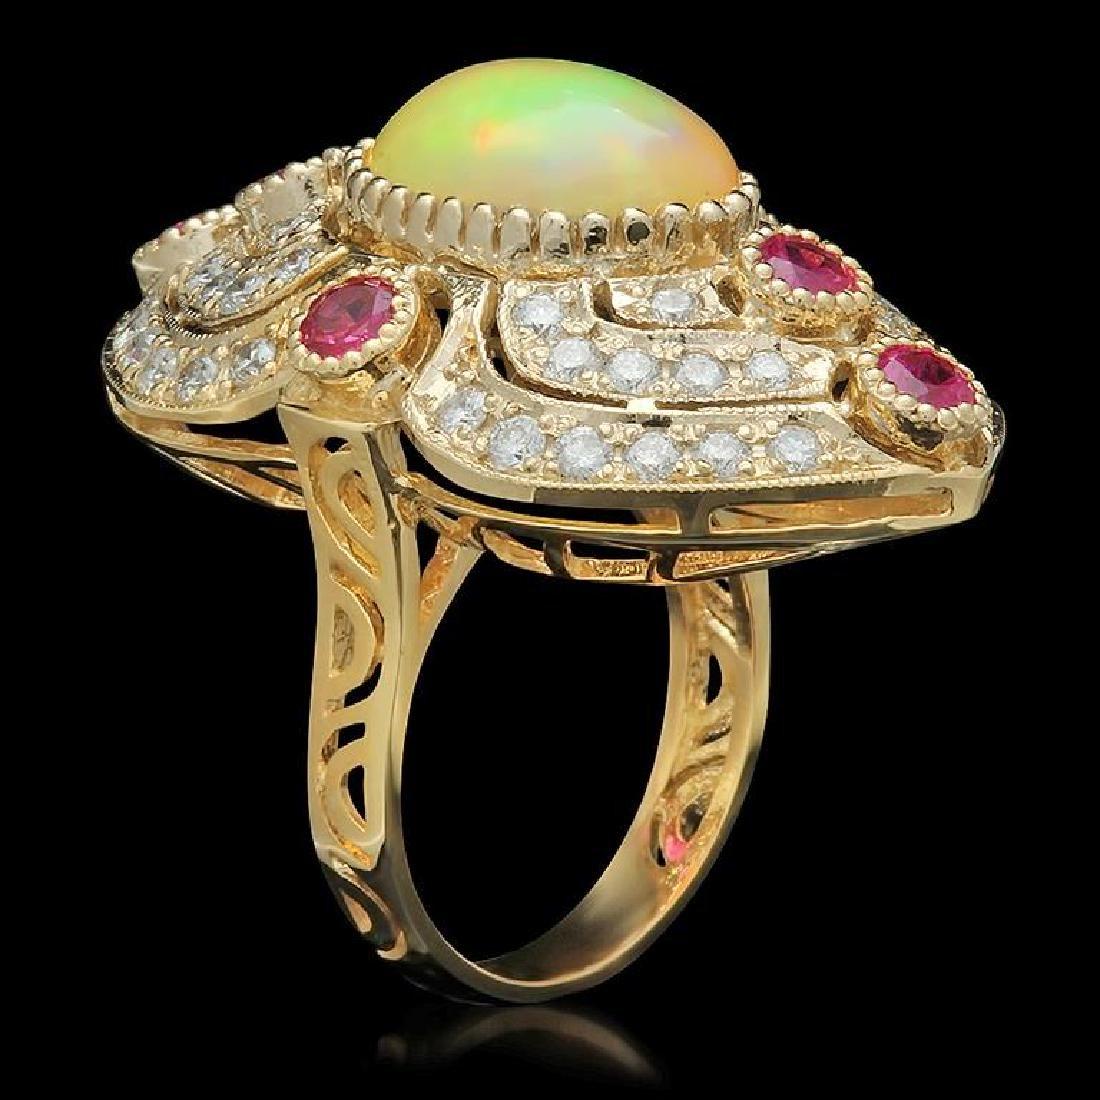 14K Gold 3.60ct Opal, 1.20ct Ruby & 1.51ct Diamond Ring - 2